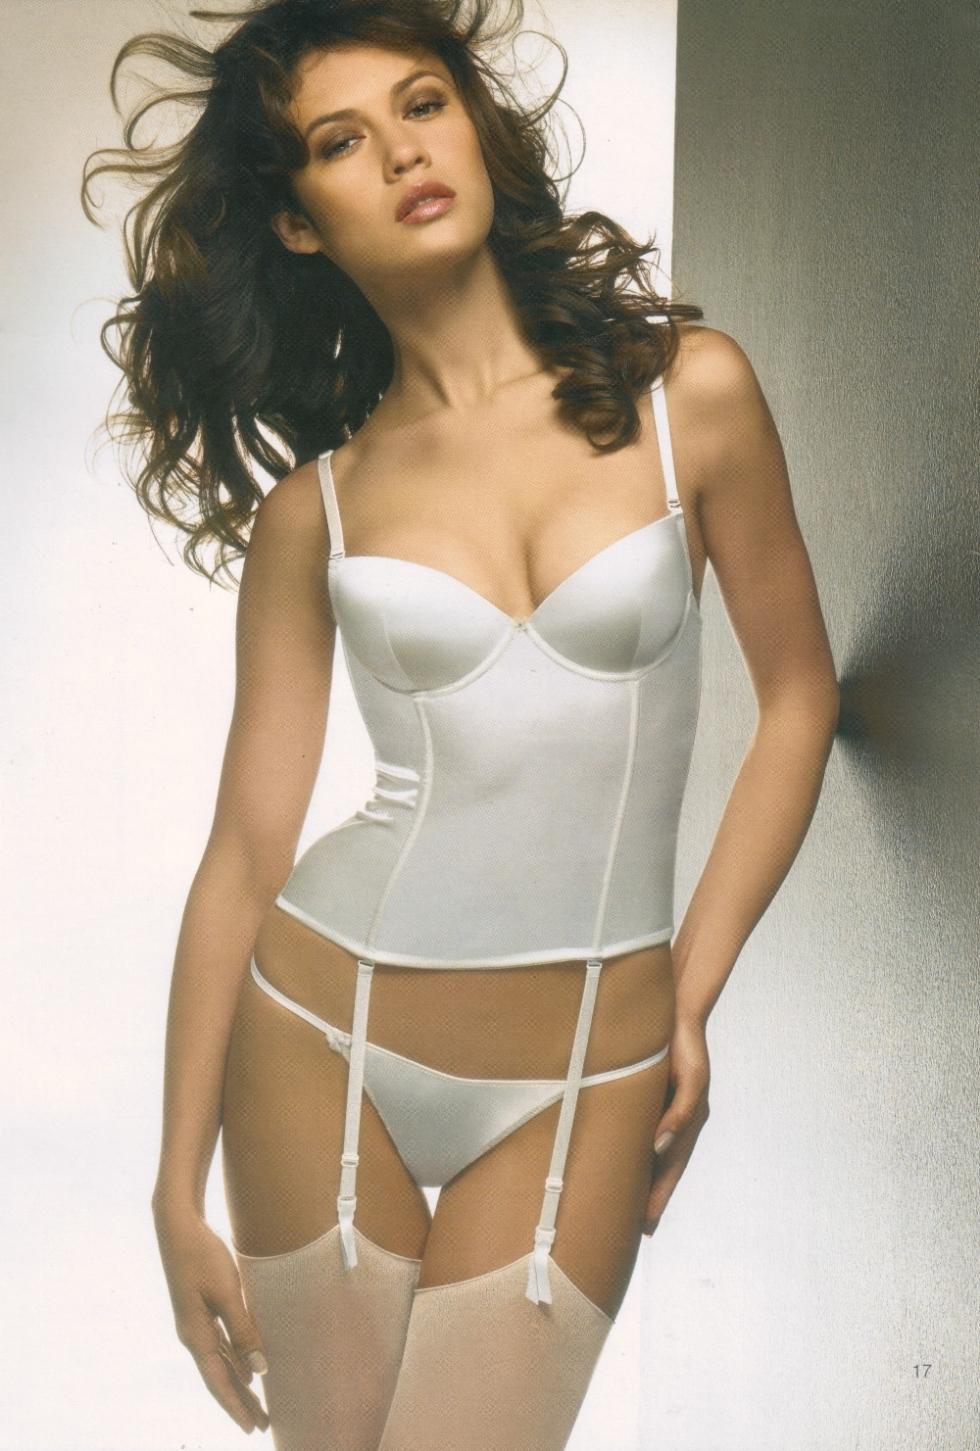 Olga Kurylenko nude collection ~ Beautiful Big Boobs Nude: makingveganbabies.blogspot.com/2013/01/olga-kurylenko-nude...